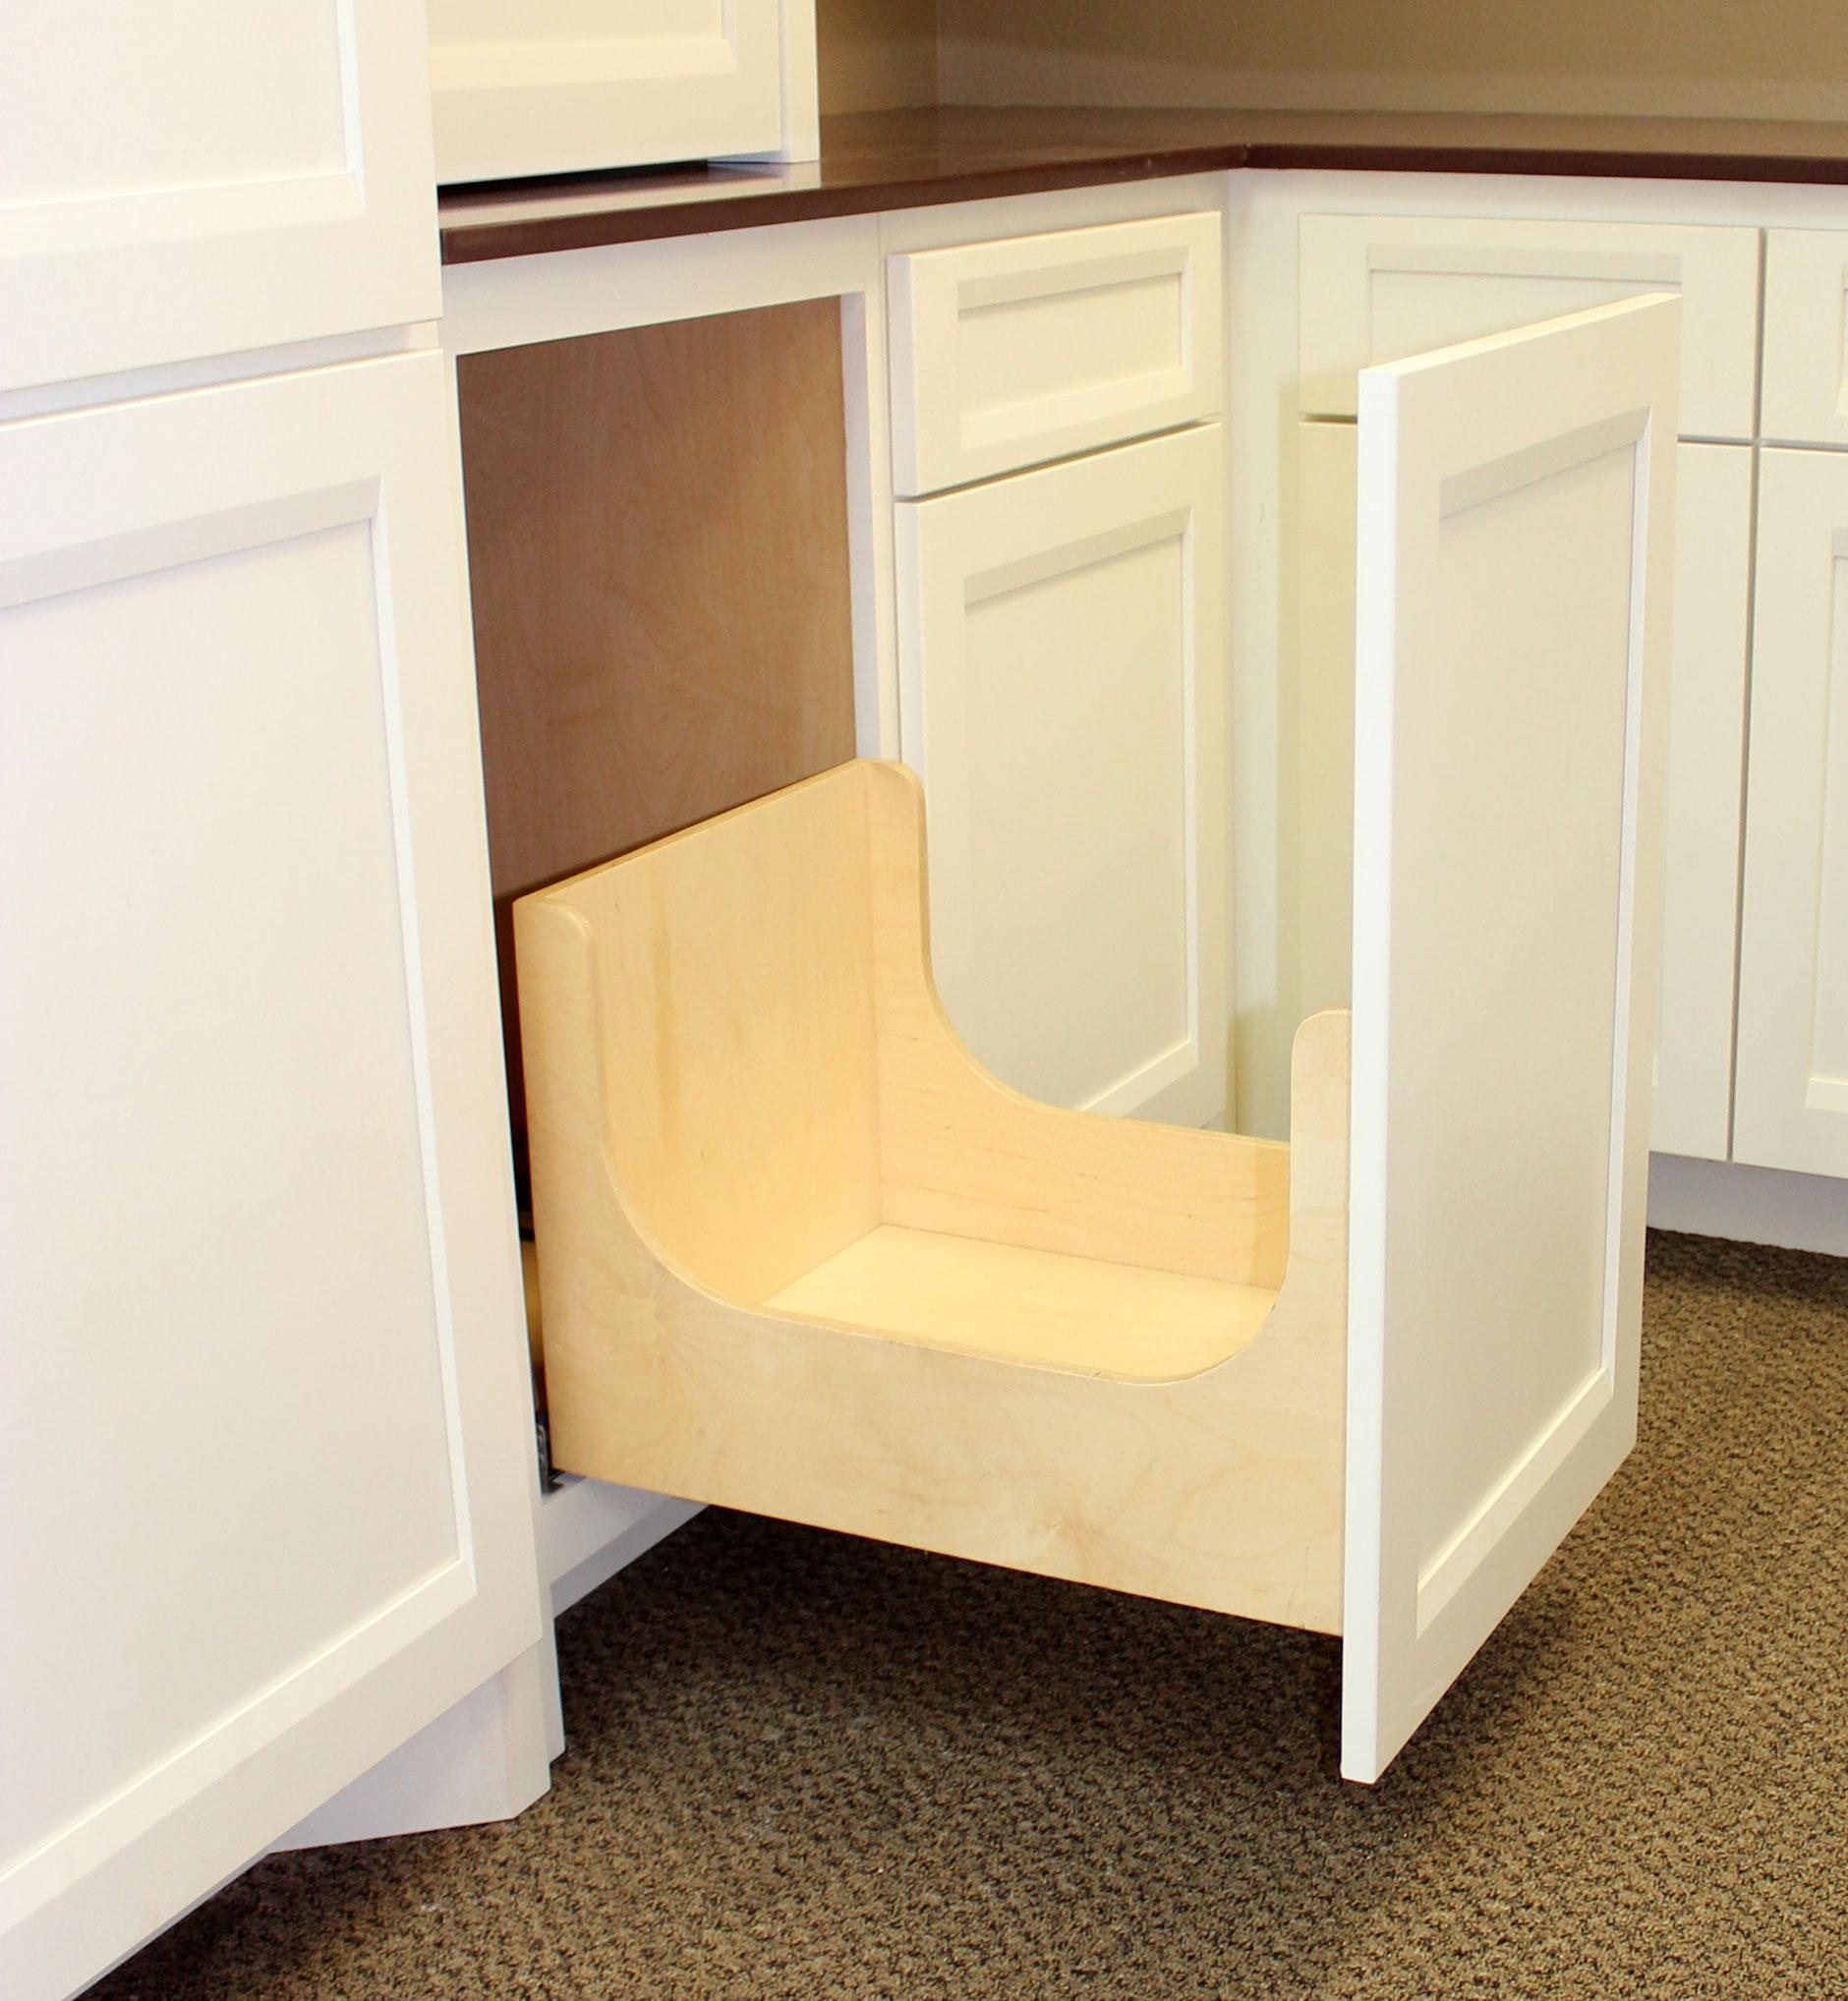 Universal Kitchen Design Burrows Cabinets